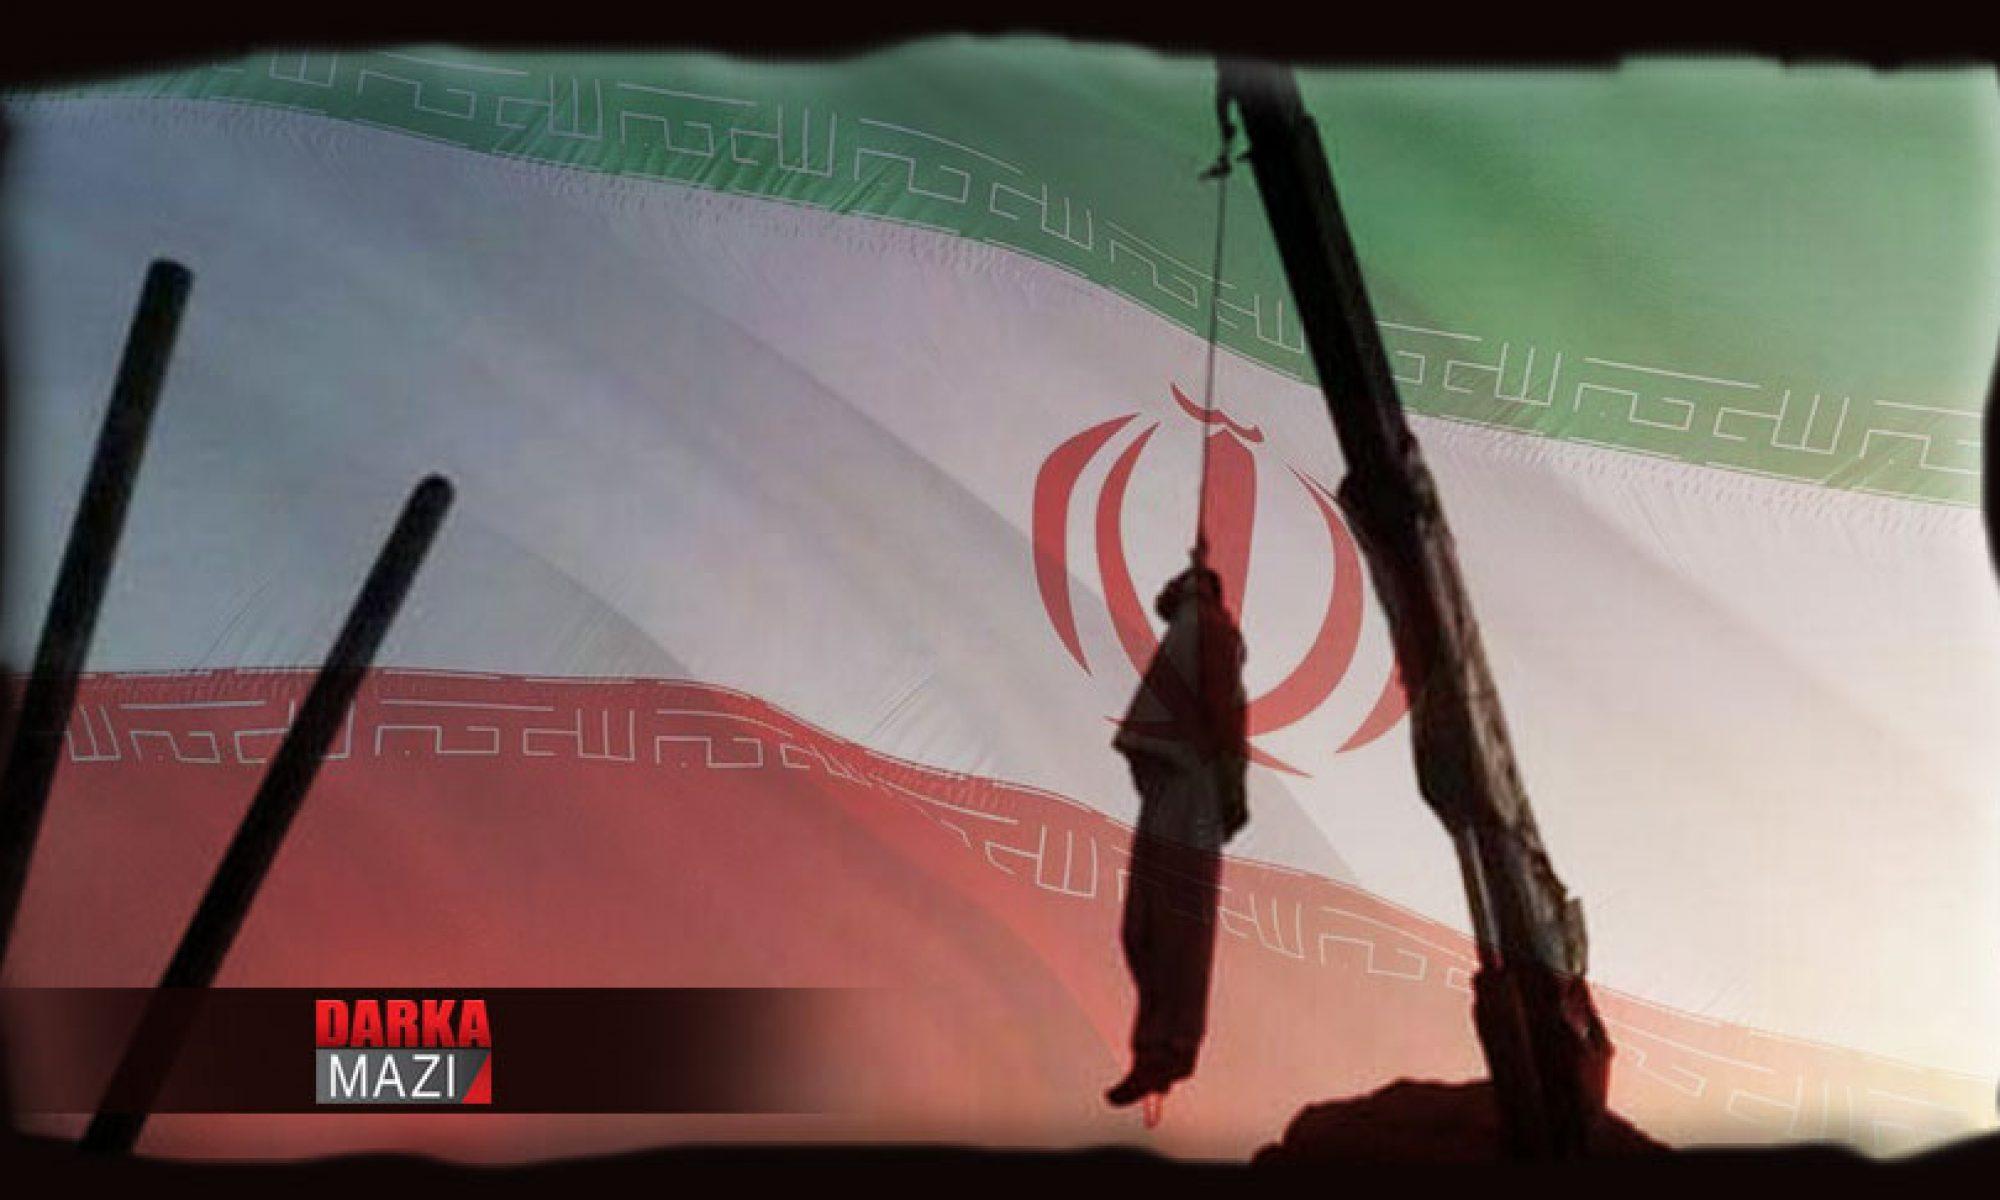 İran rejimi 2019 yılı boyunca 52 kişiyi idam etti